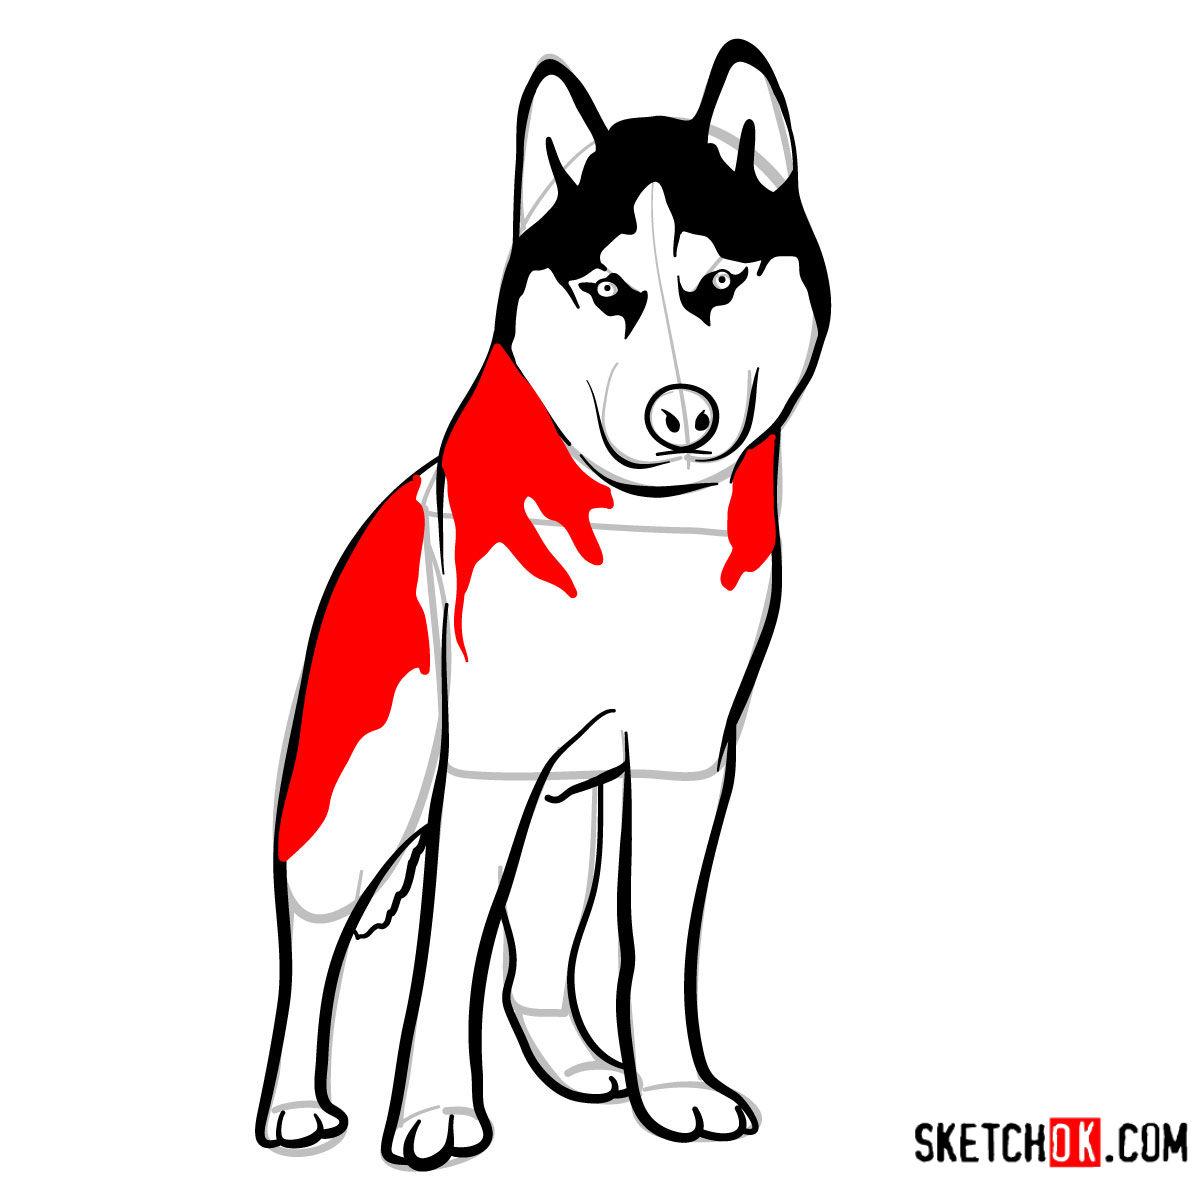 How to draw the Husky dog - step 10